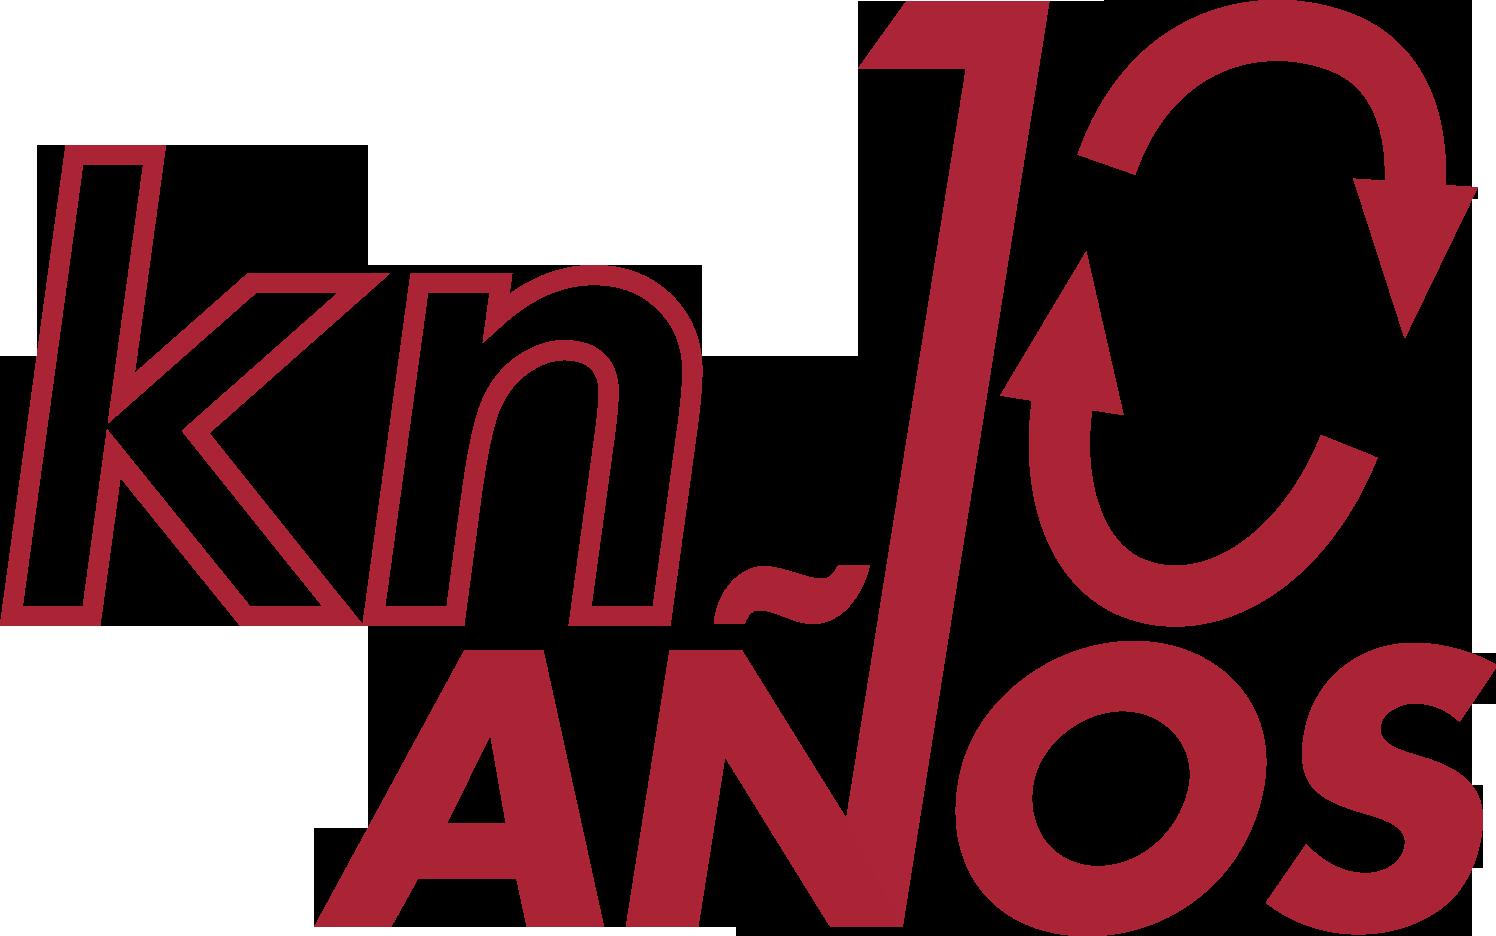 LogoKnowcentury10a